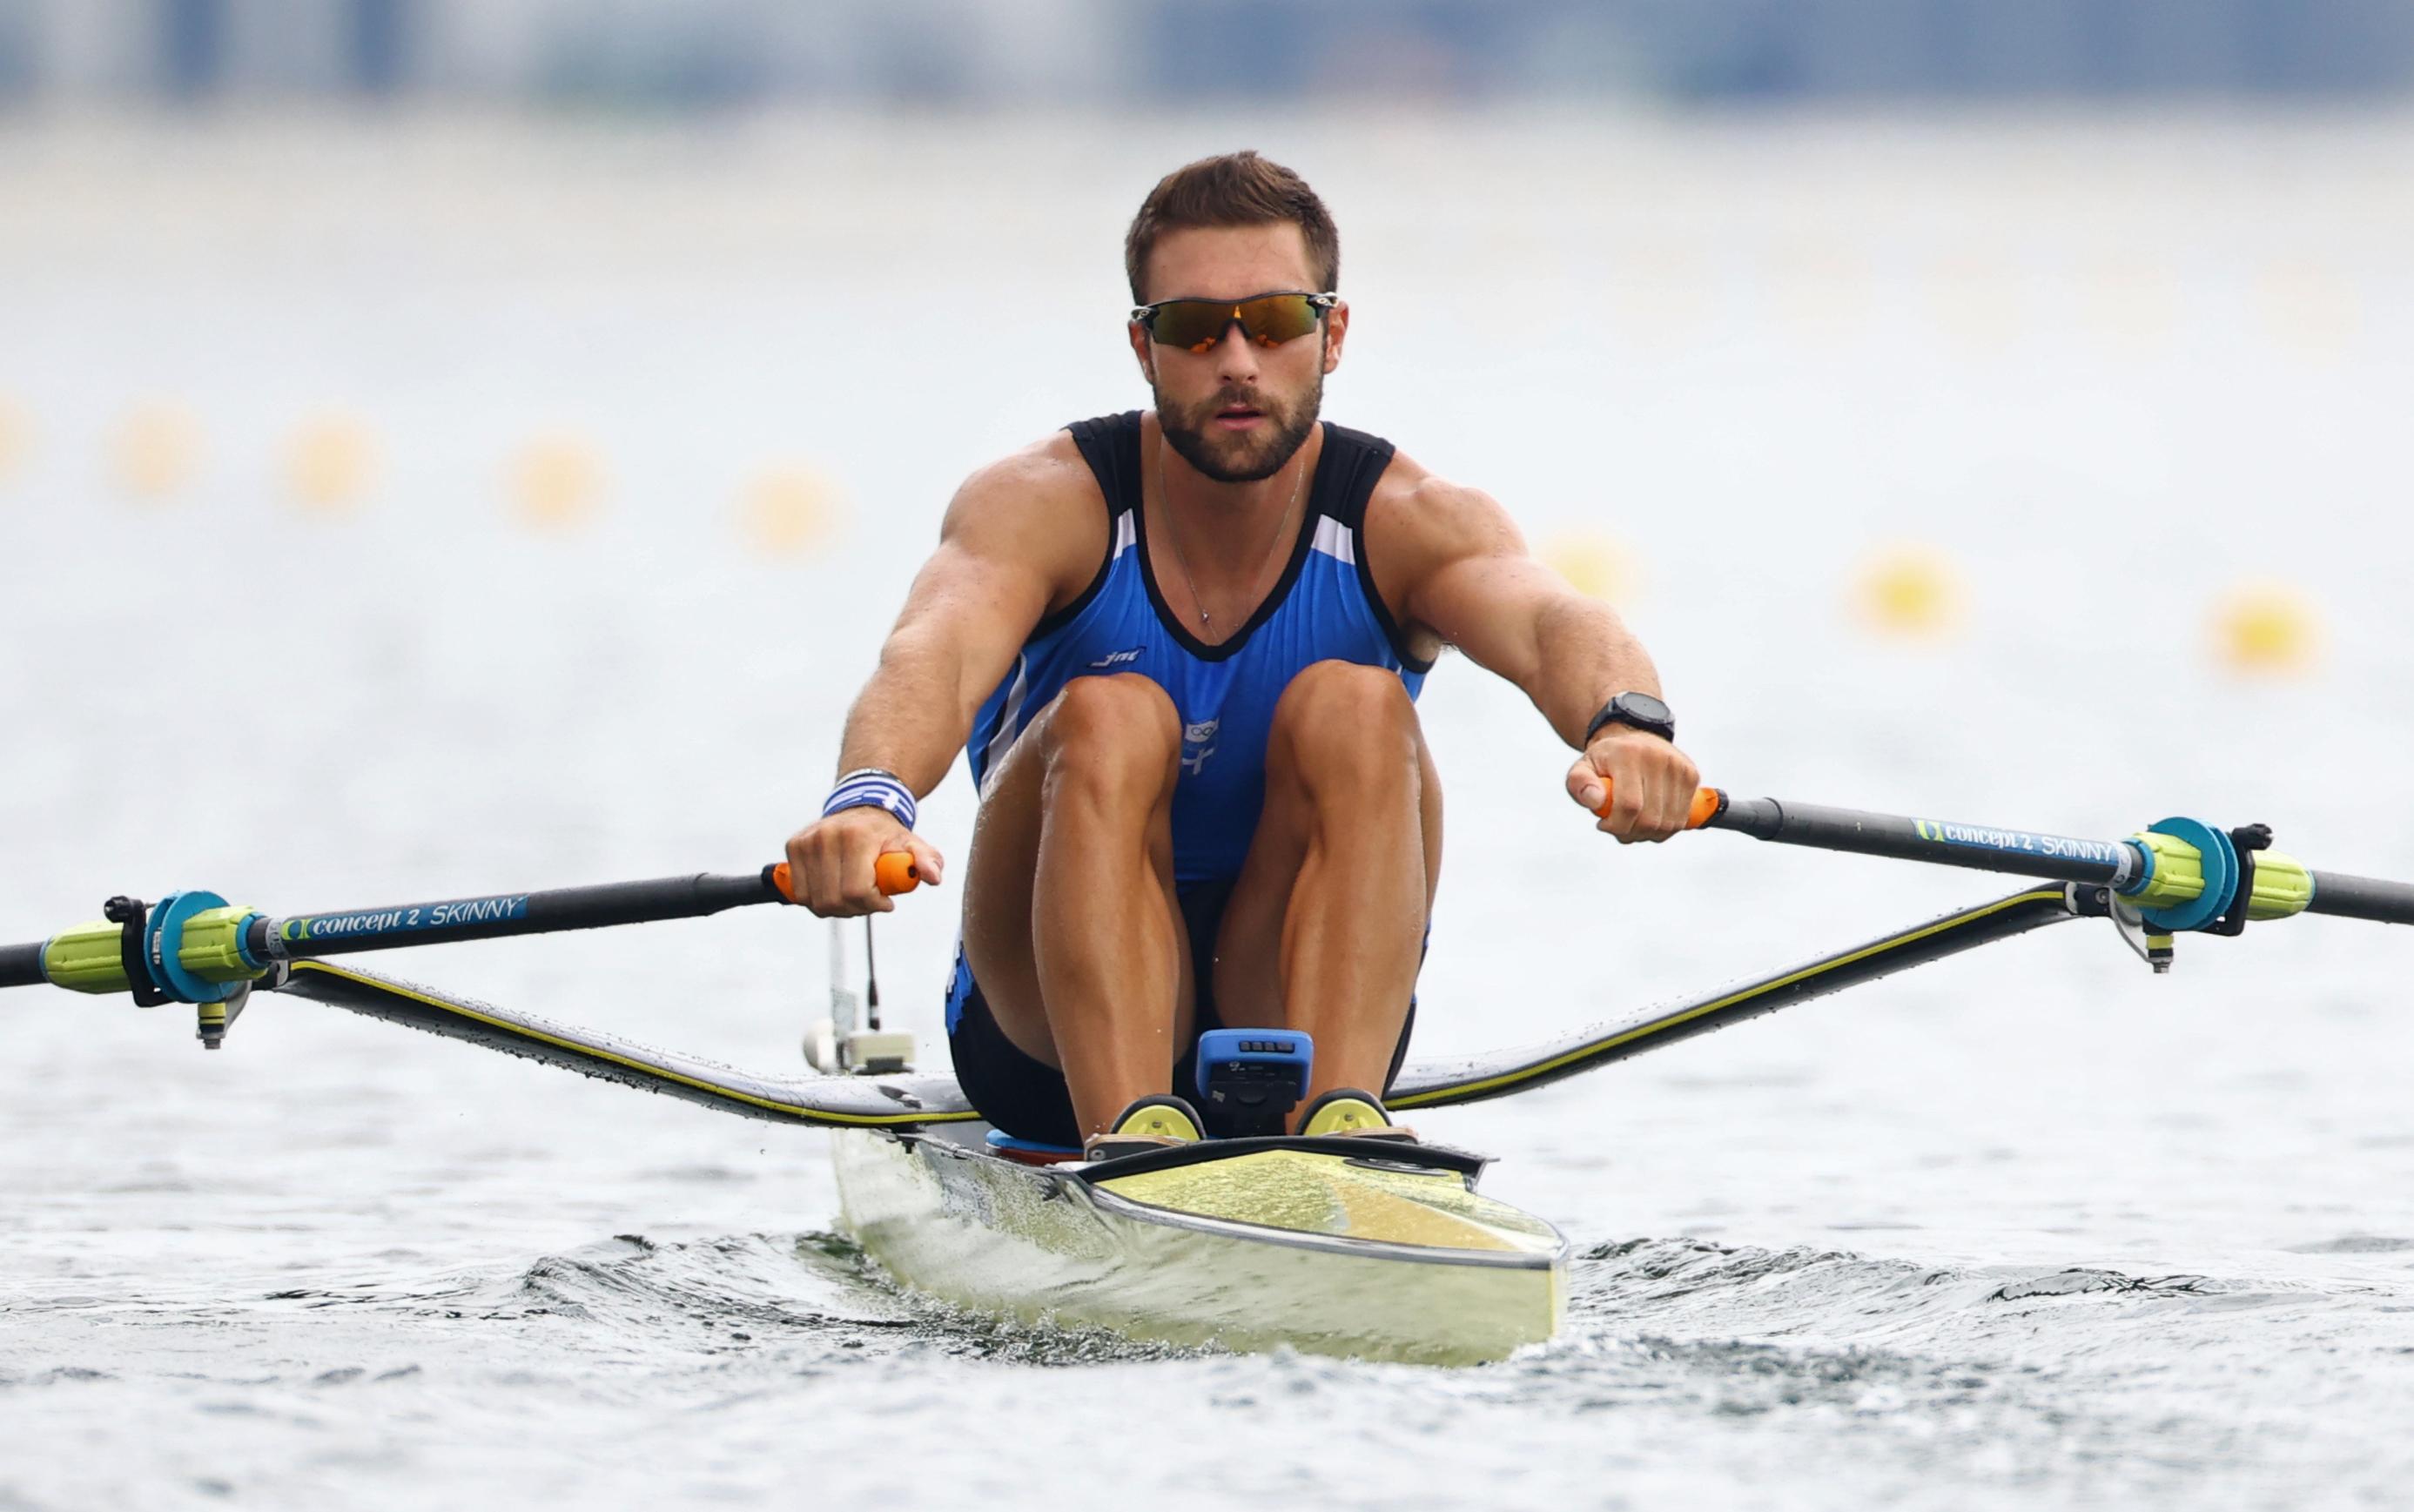 Tokyo 2020 Olympics - Rowing - Men's Single Sculls - Final A - Sea Forest Waterway, Tokyo, Japan - July 30, 2021. Stefanos Ntouskos of Greece in action REUTERS/Leah Millis